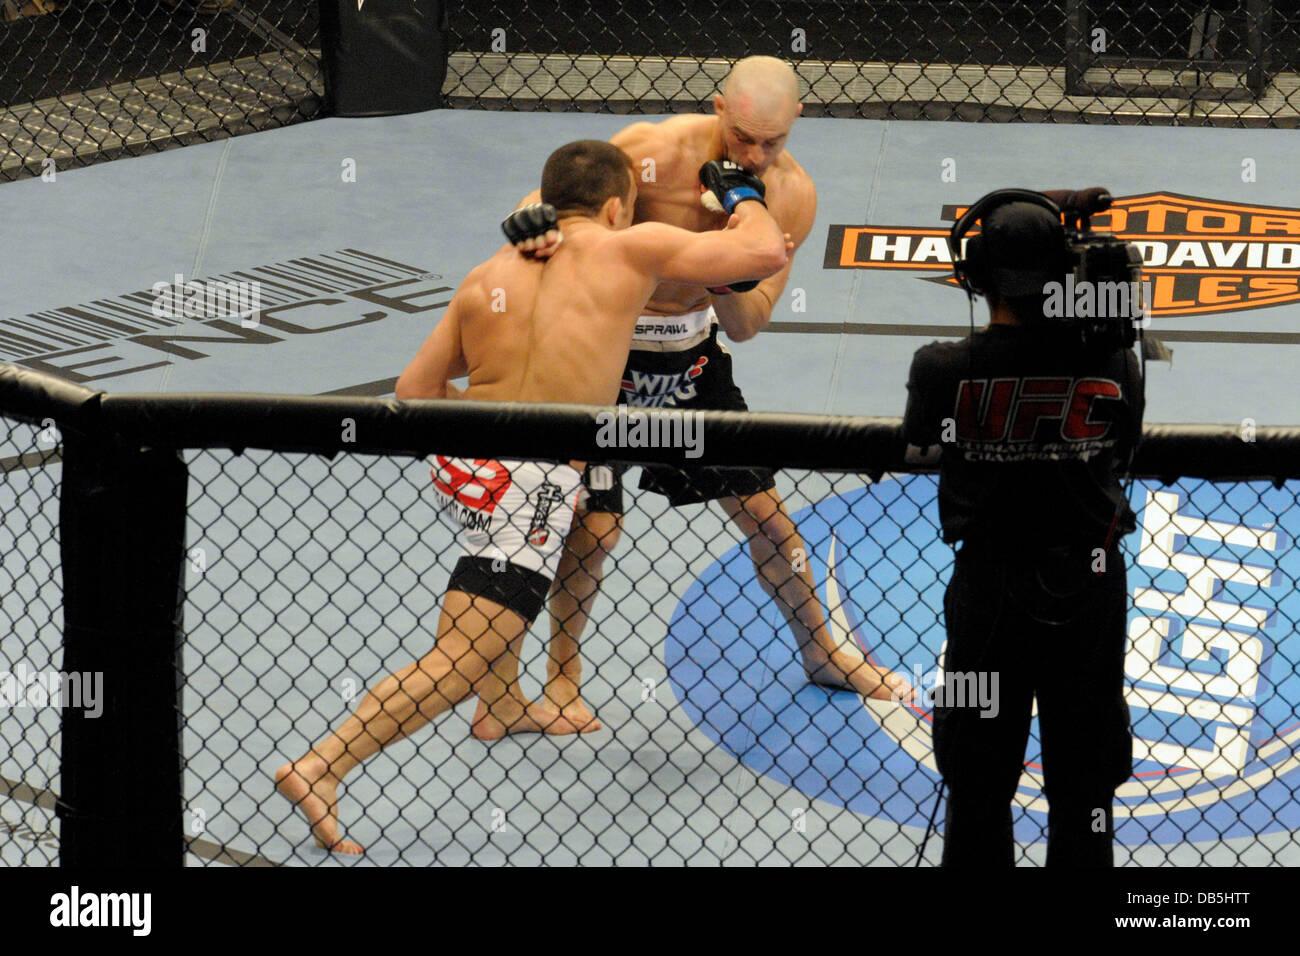 Jake Ellenberger vs sean Pierson UFC 129 - Welter Bout celebró en el Rogers Centre. Toronto, Canada - 30.04.11 Foto de stock